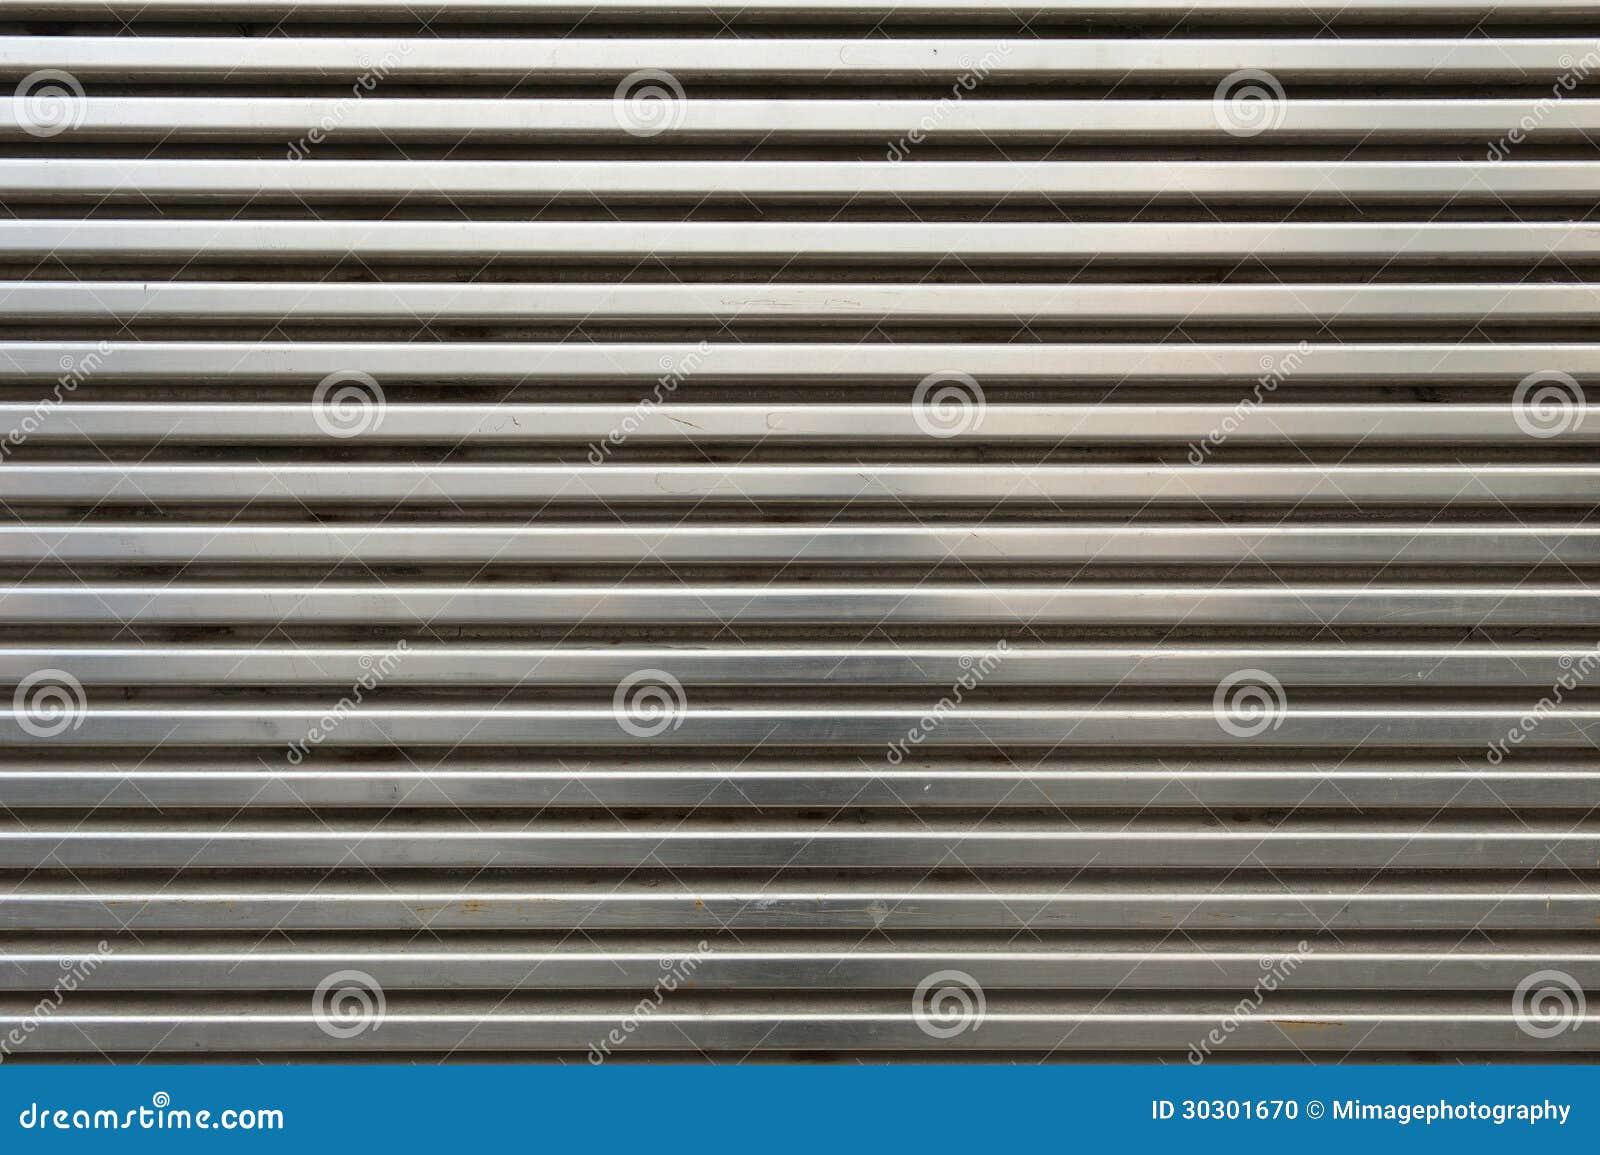 Shiny Metal Grill Wall Stock Photography Cartoondealer